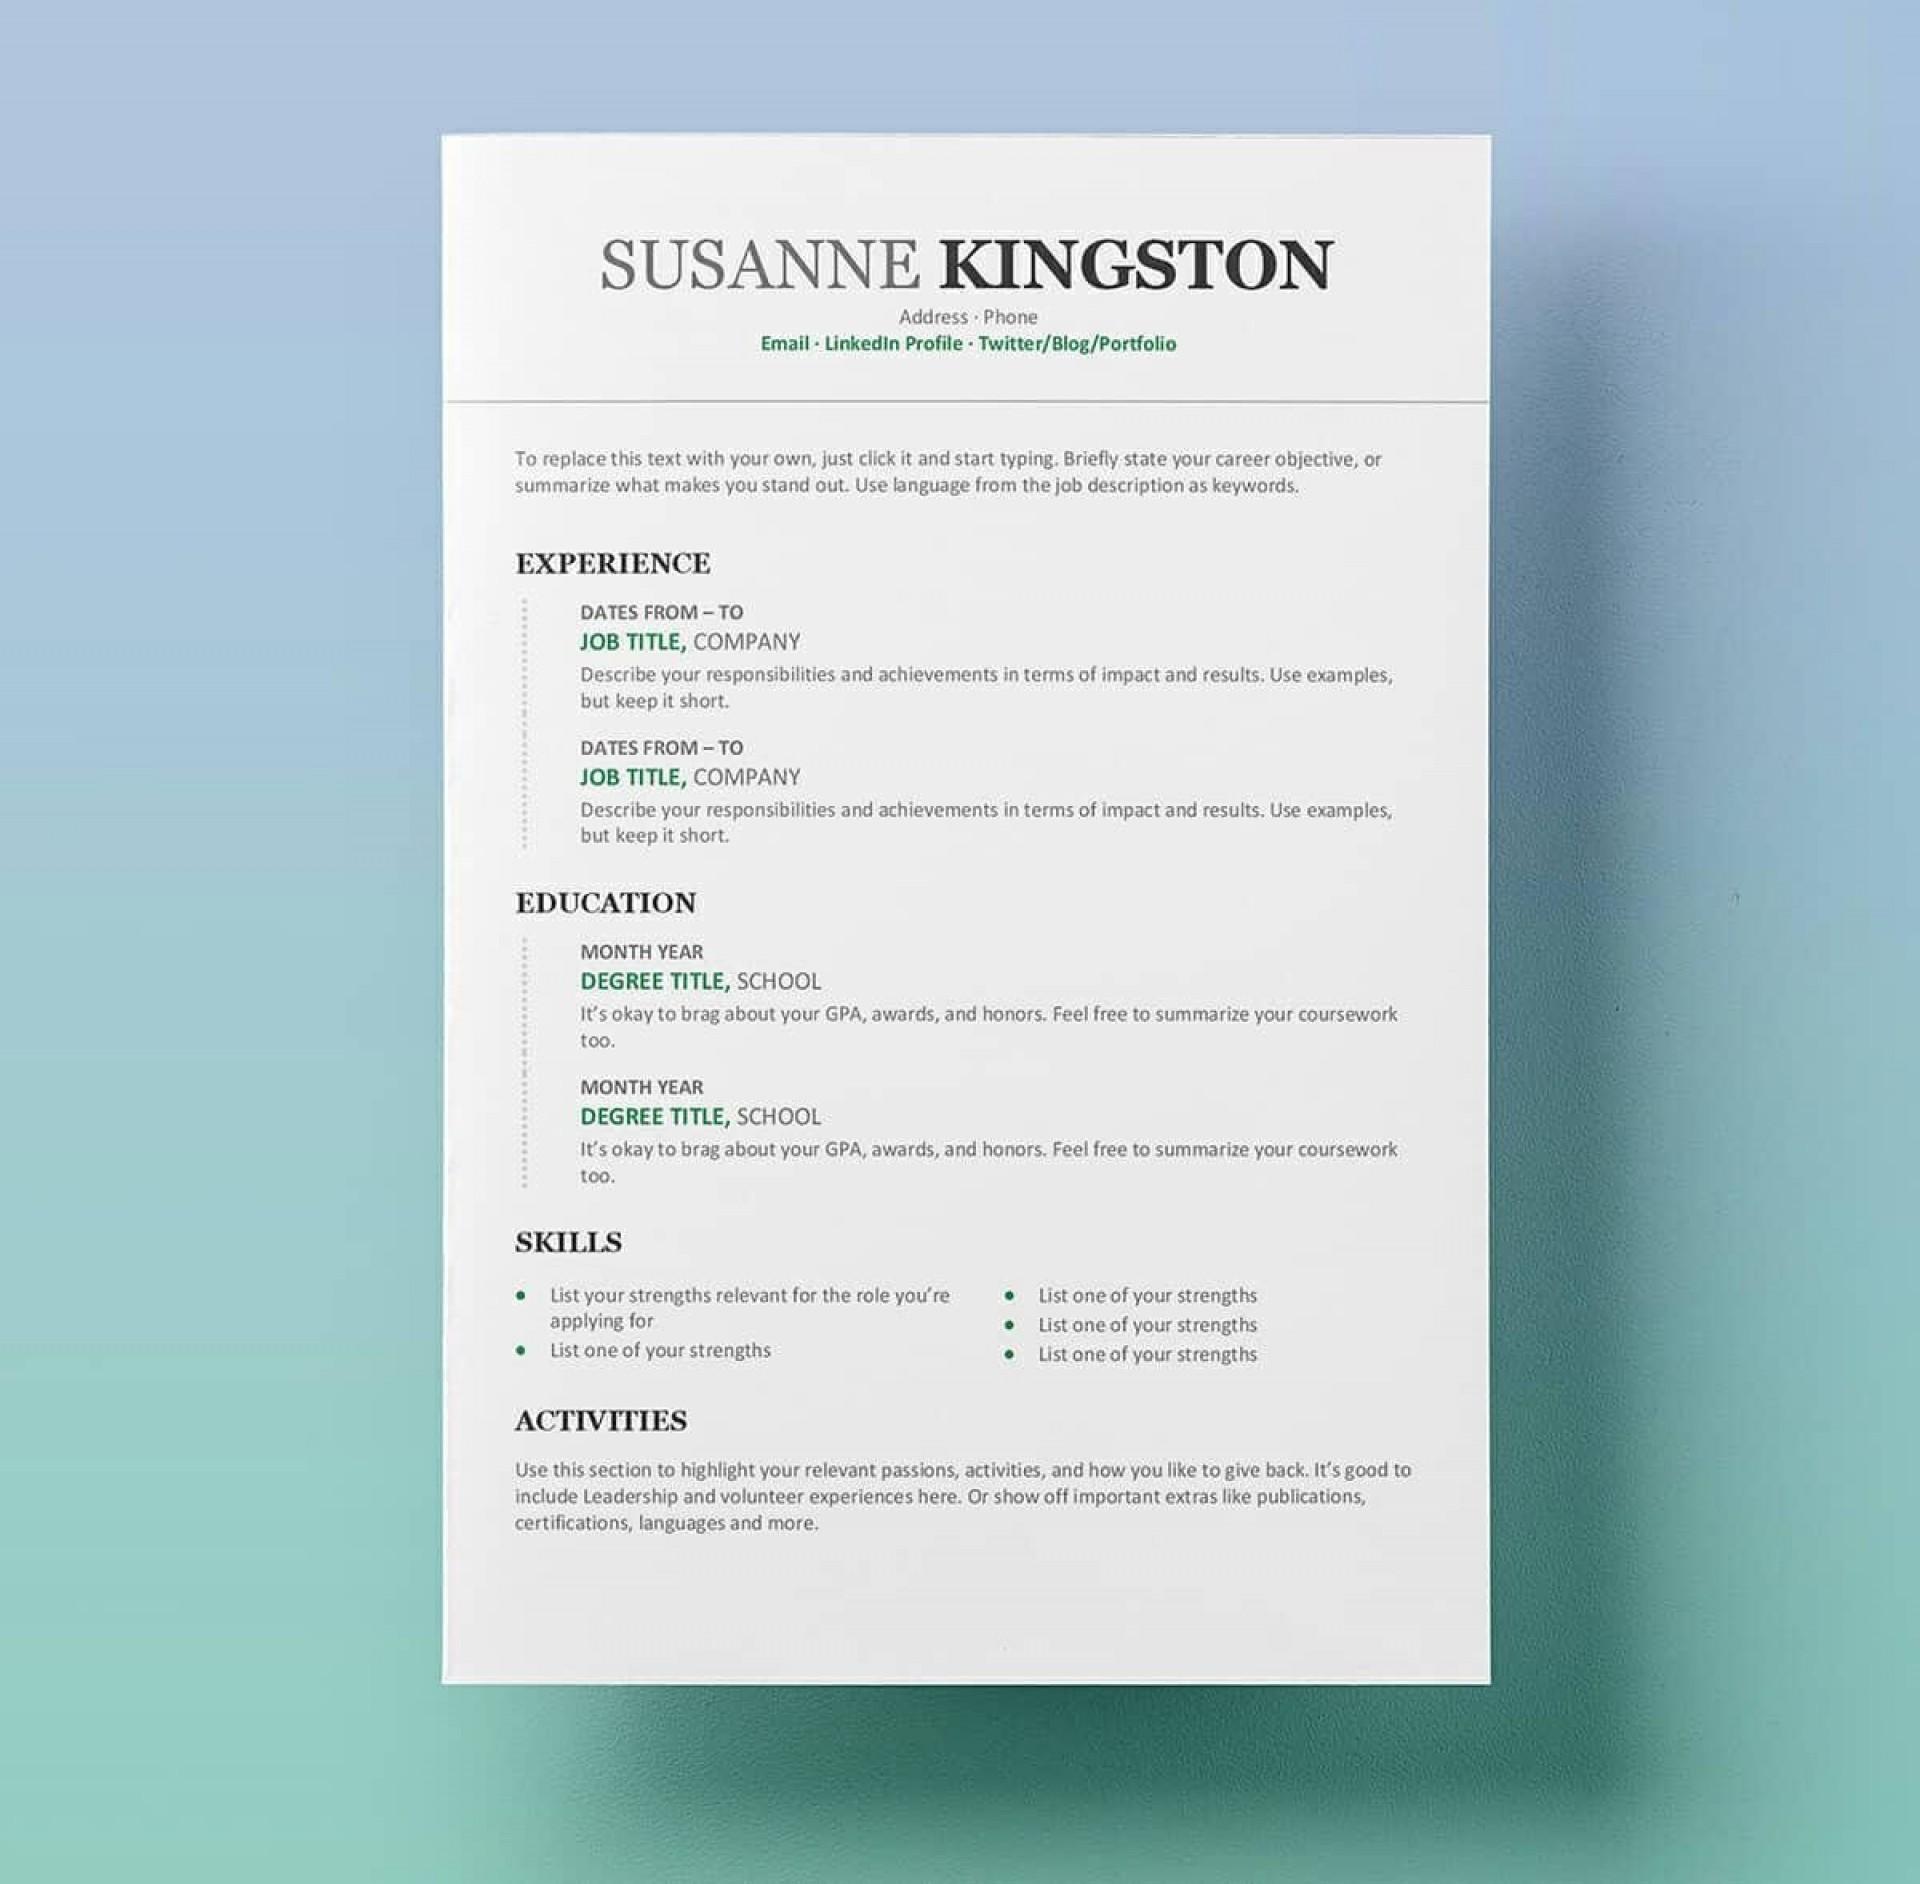 009 Best Free Simple Resume Template Microsoft Word Design 1920